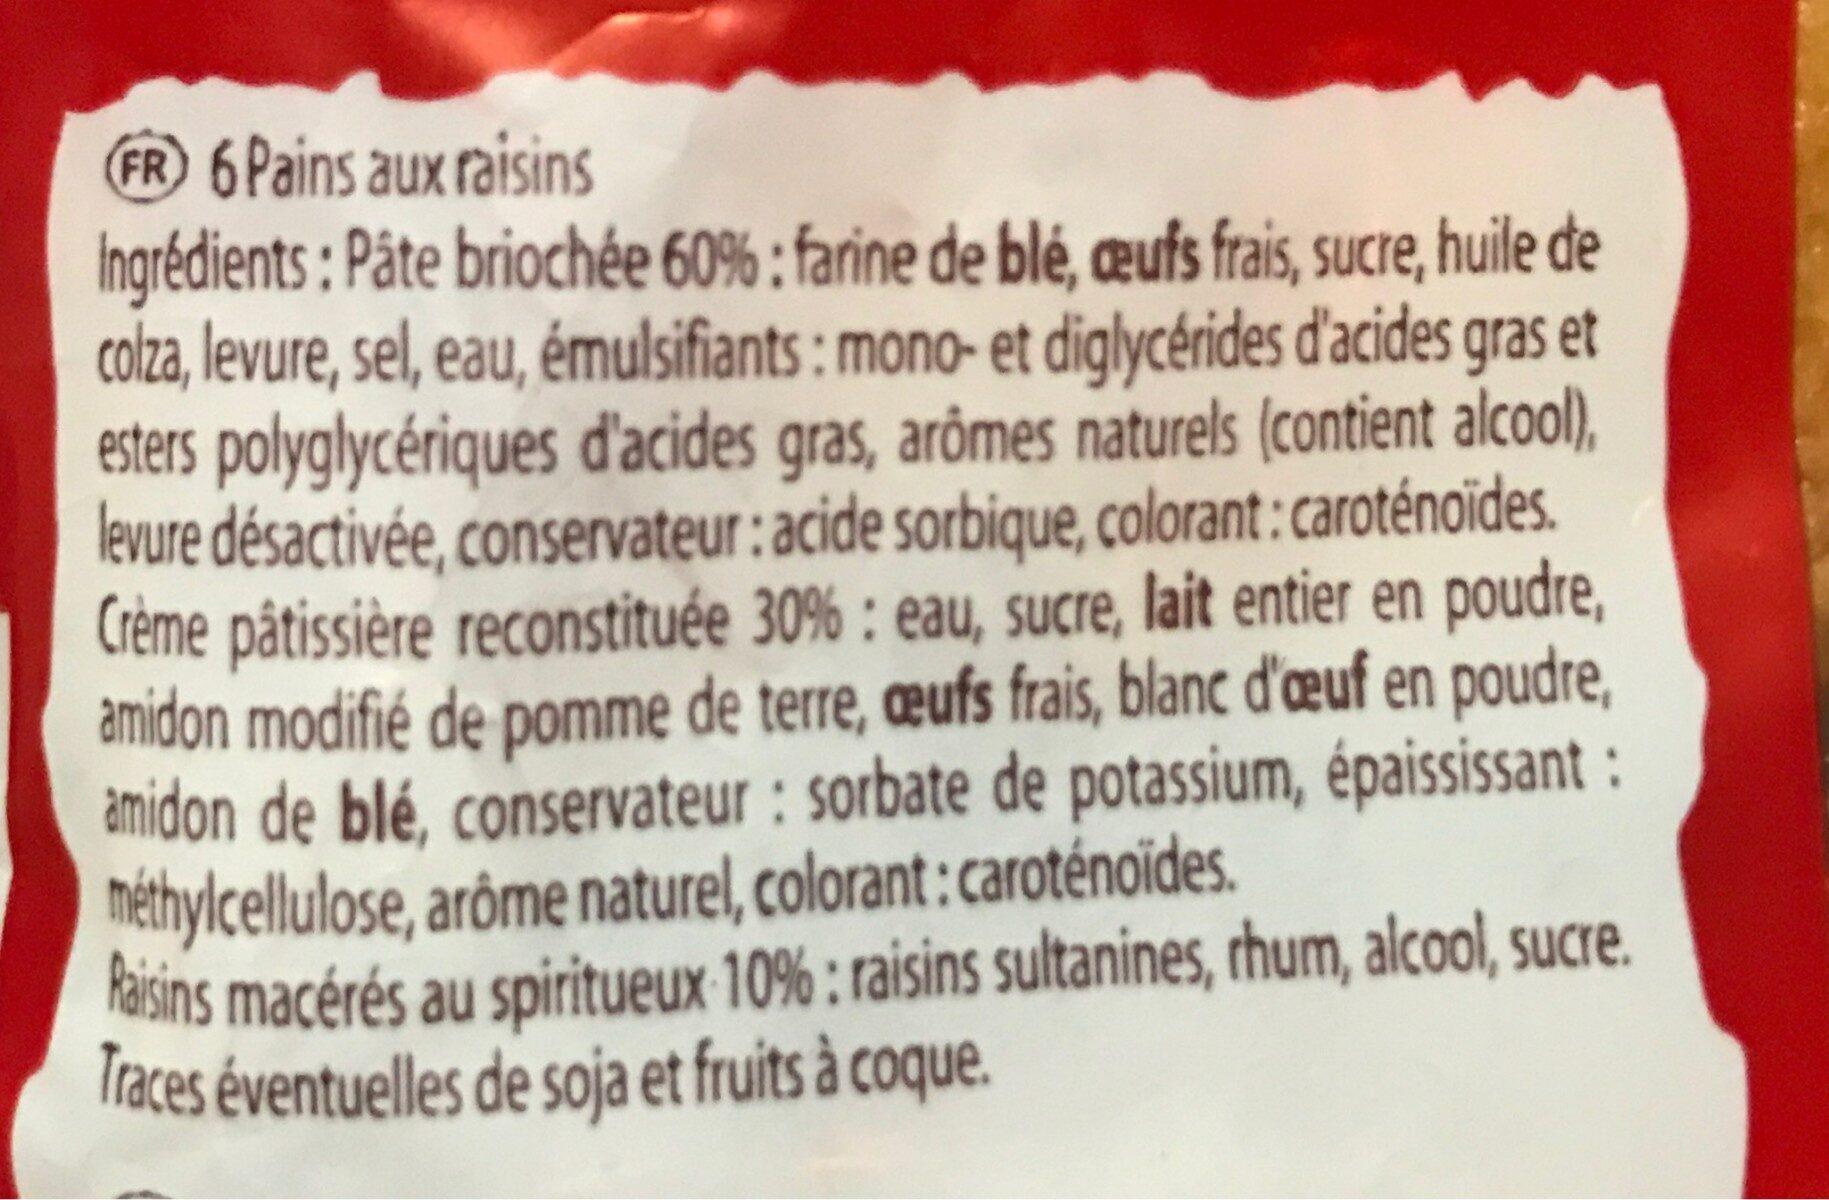 Pain Aux Raisins Boulang.x6 - Ingrediënten - fr